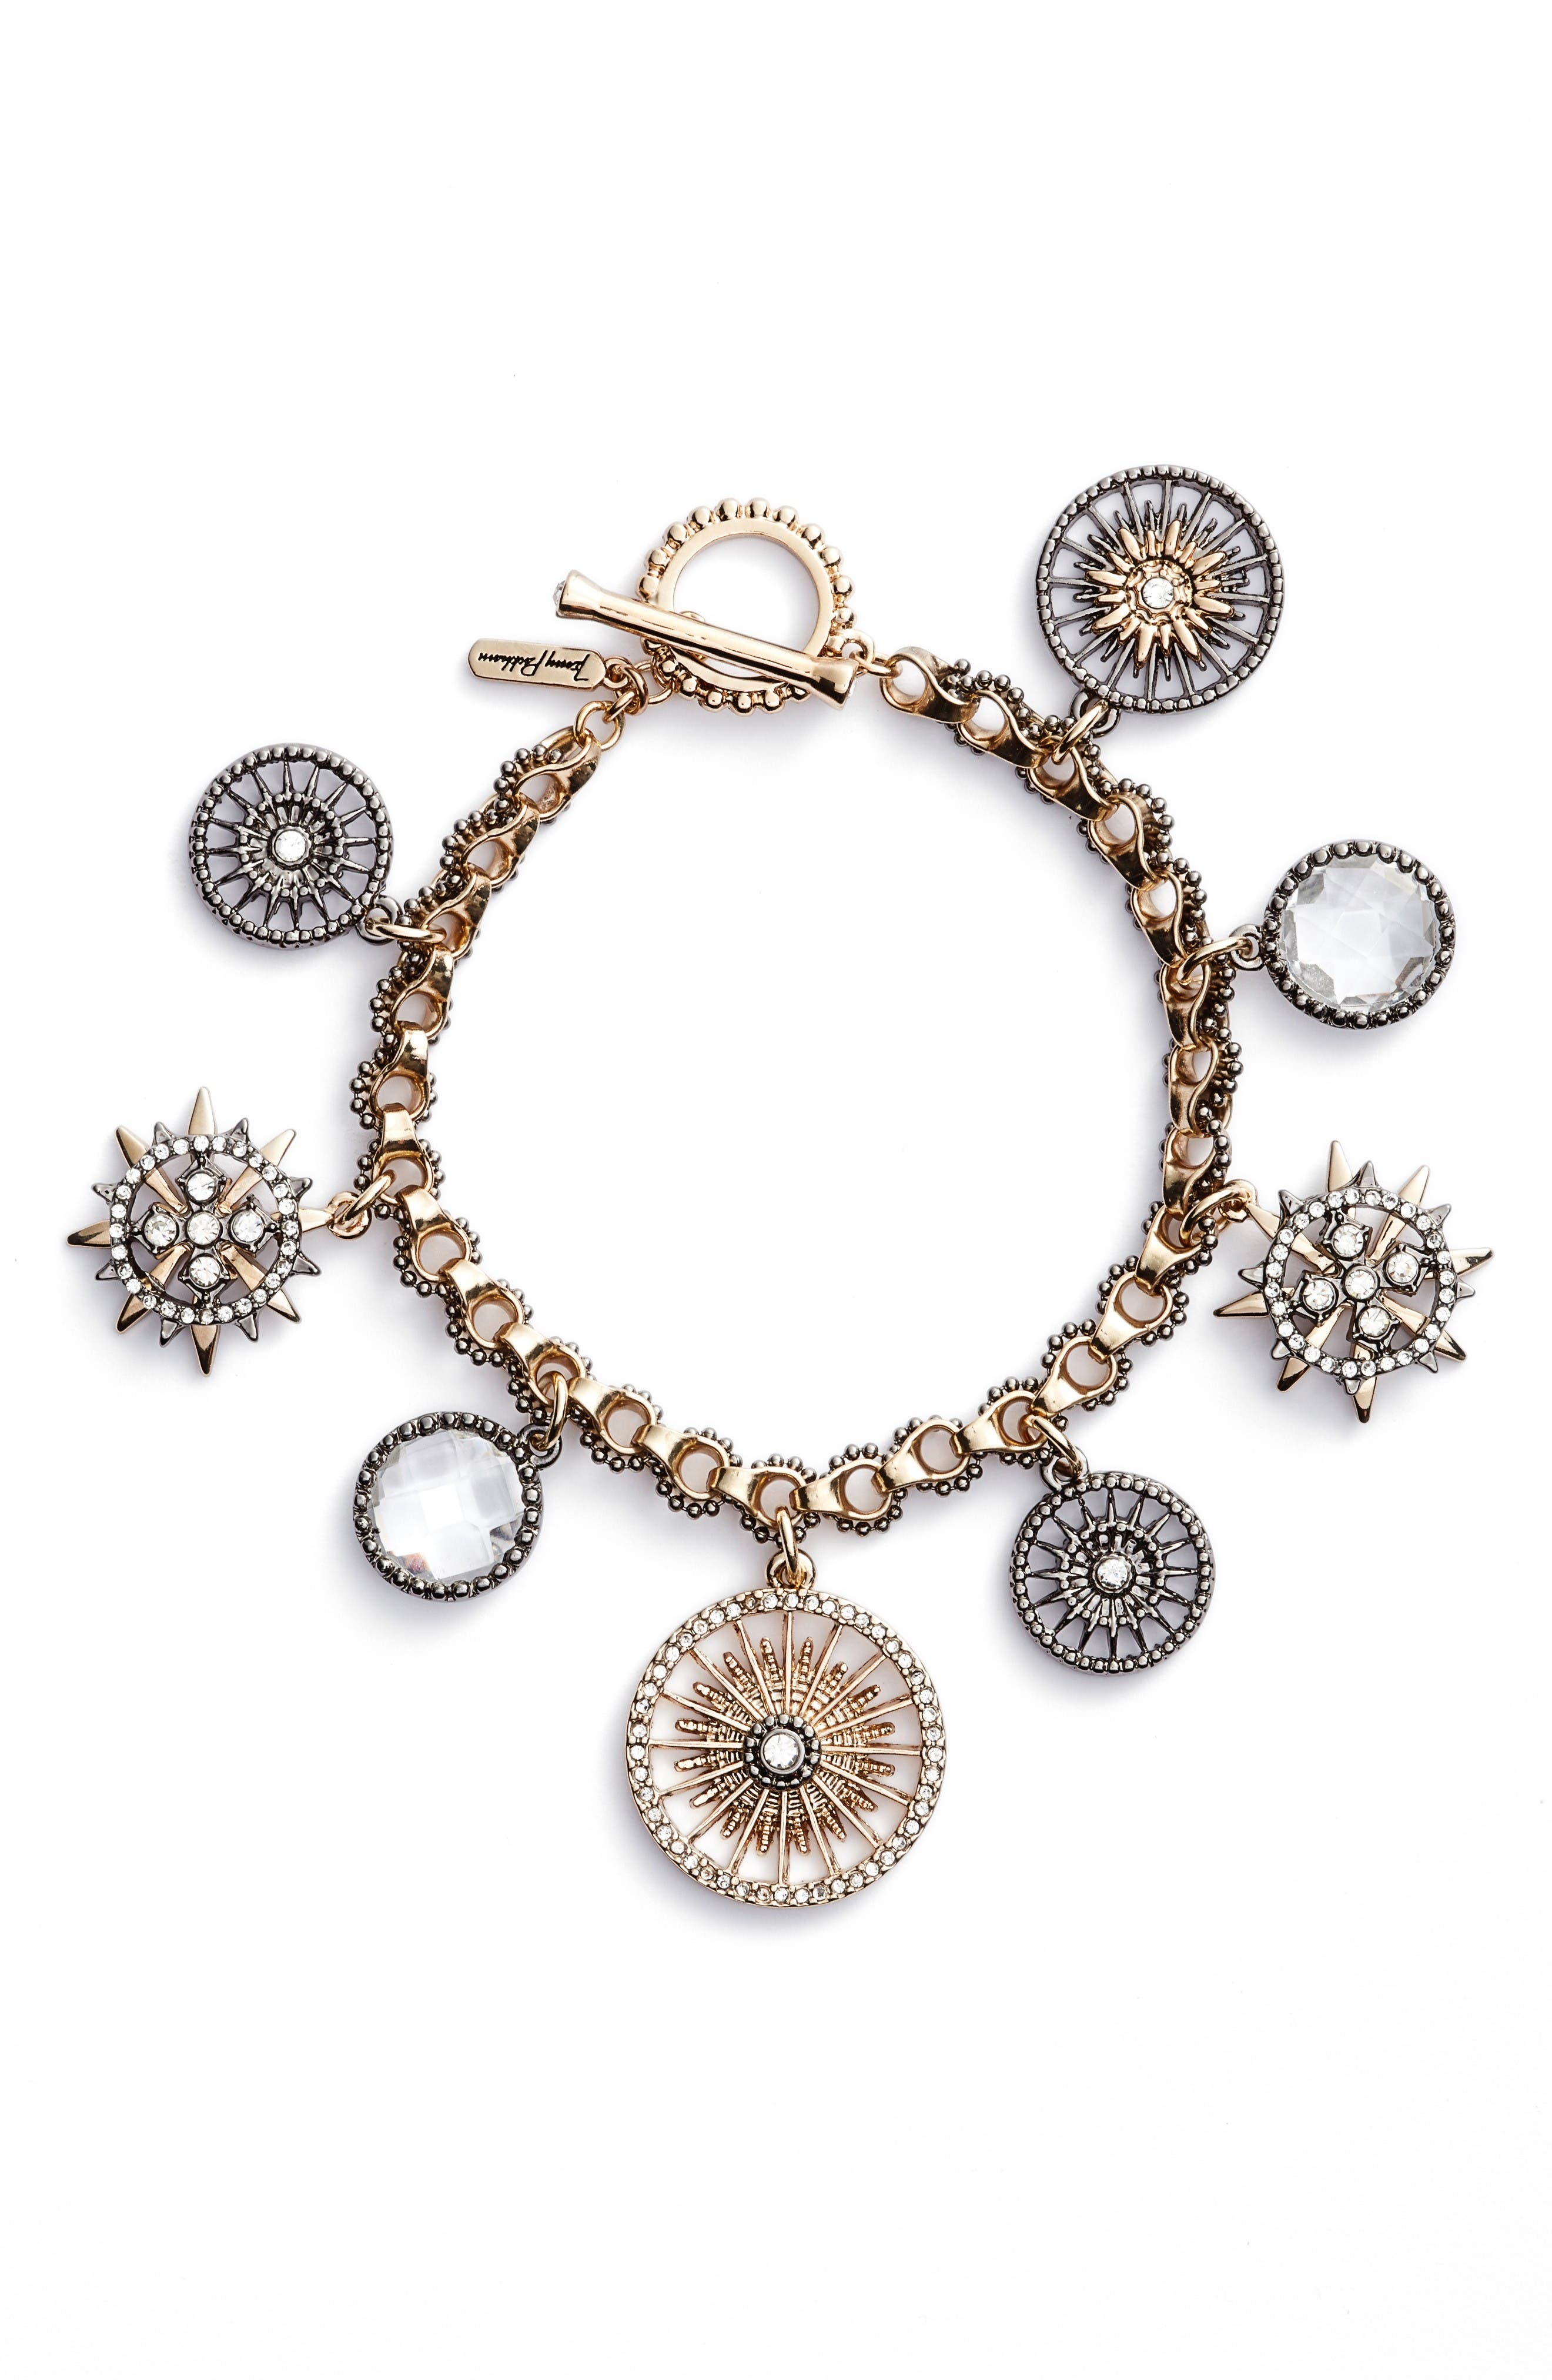 Jenny Packham Charm Bracelet